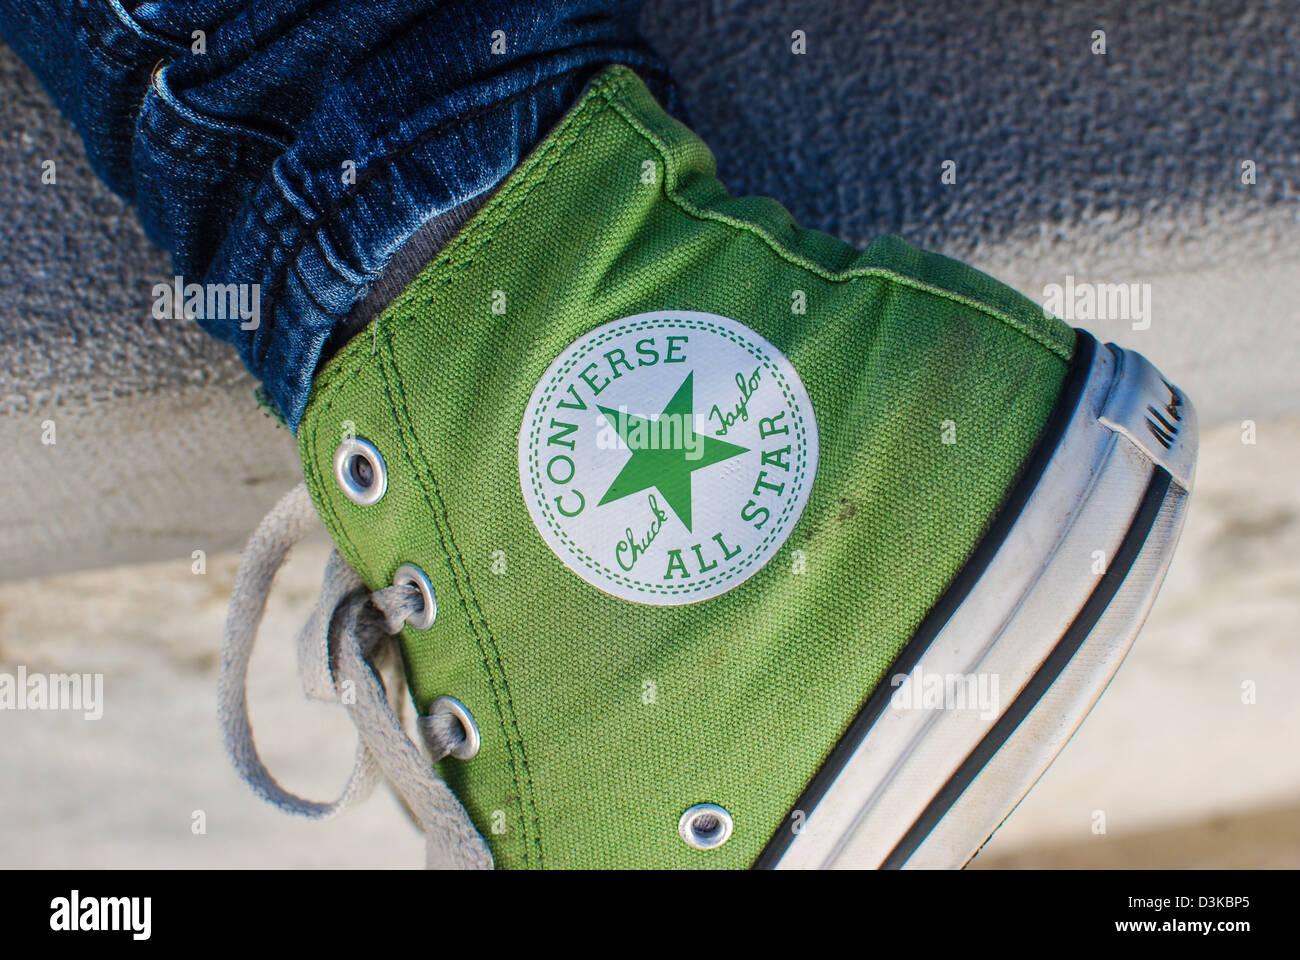 Converse shoe showing logo - Stock Image